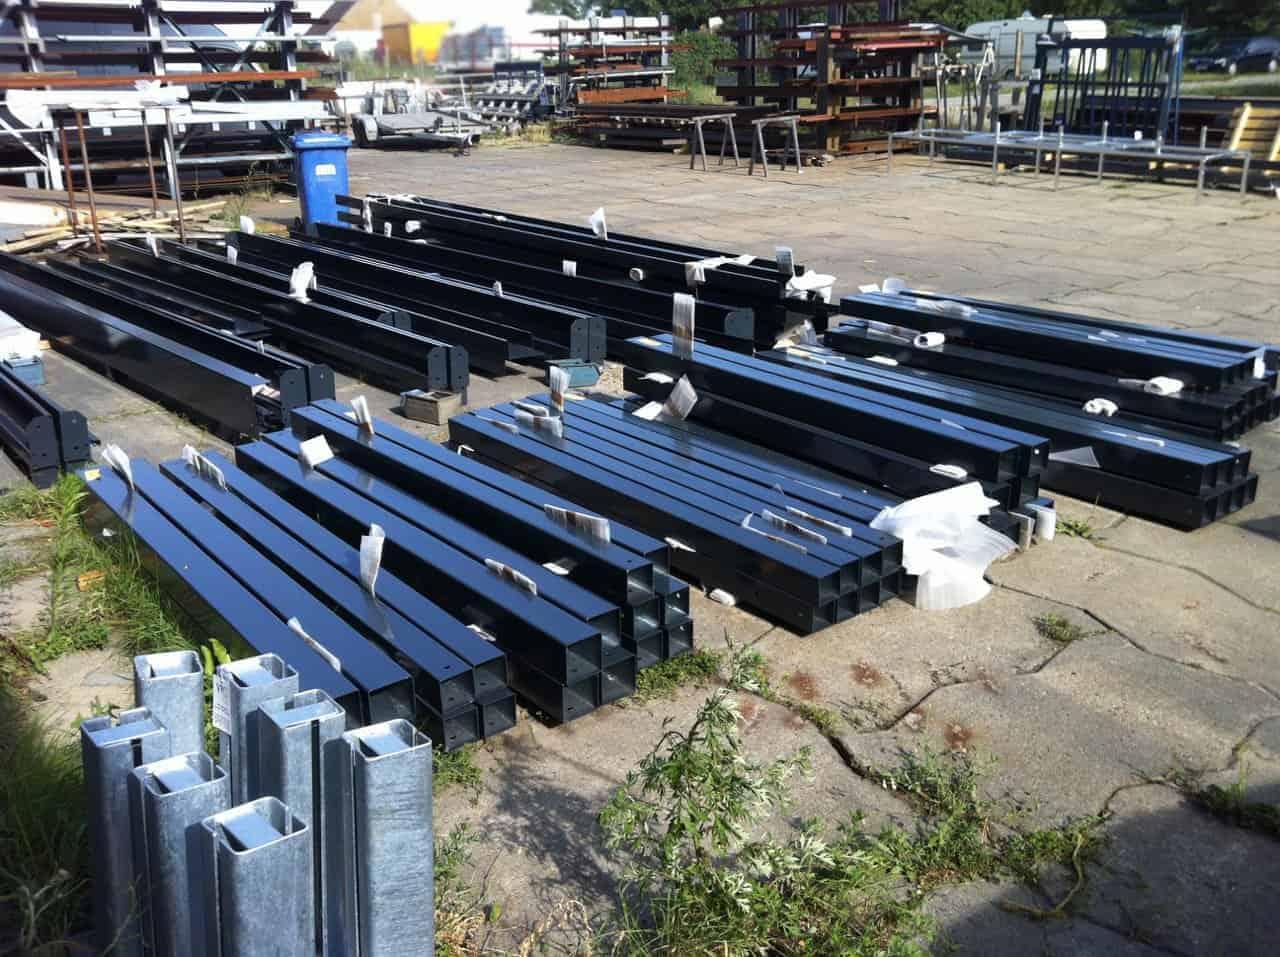 Metall Carport Material Stahl pulverbeschichtet RAL 7010 anthrazit Stahlzart timeless design